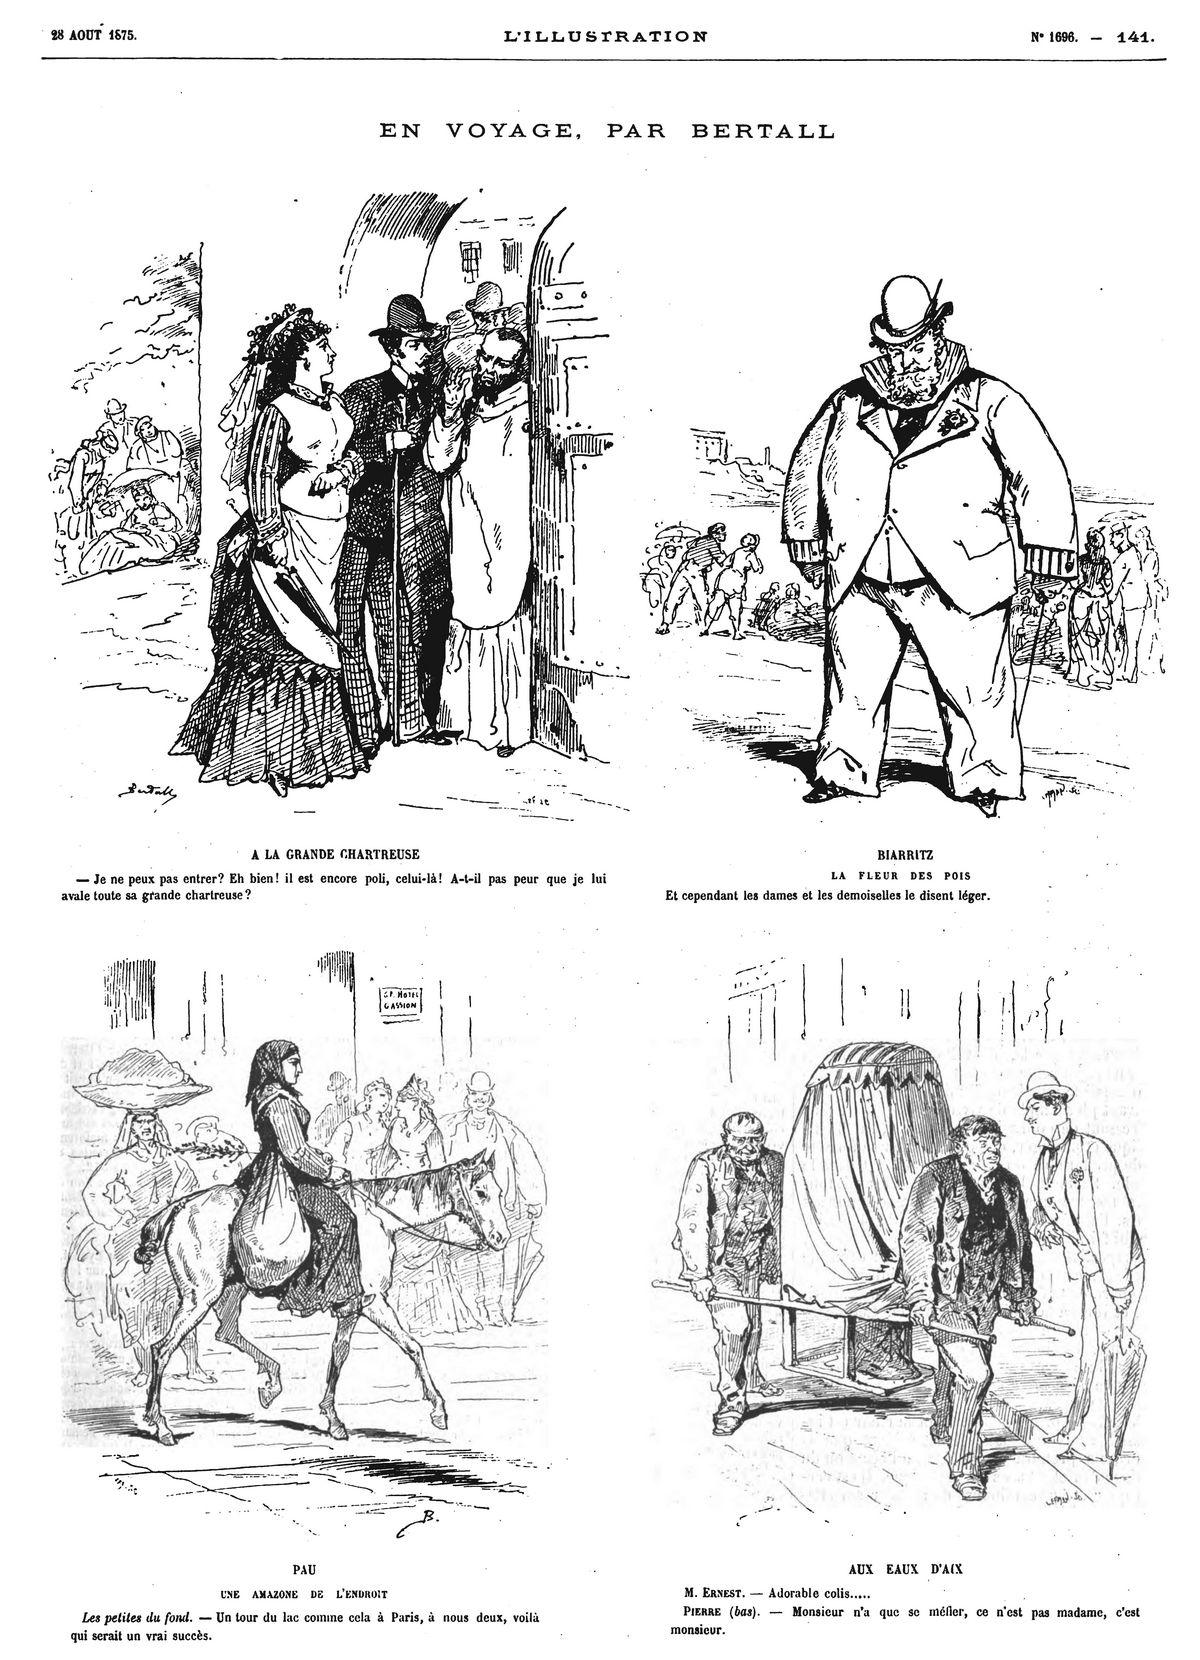 En voyage, par Bertall (4 sujets). 1875